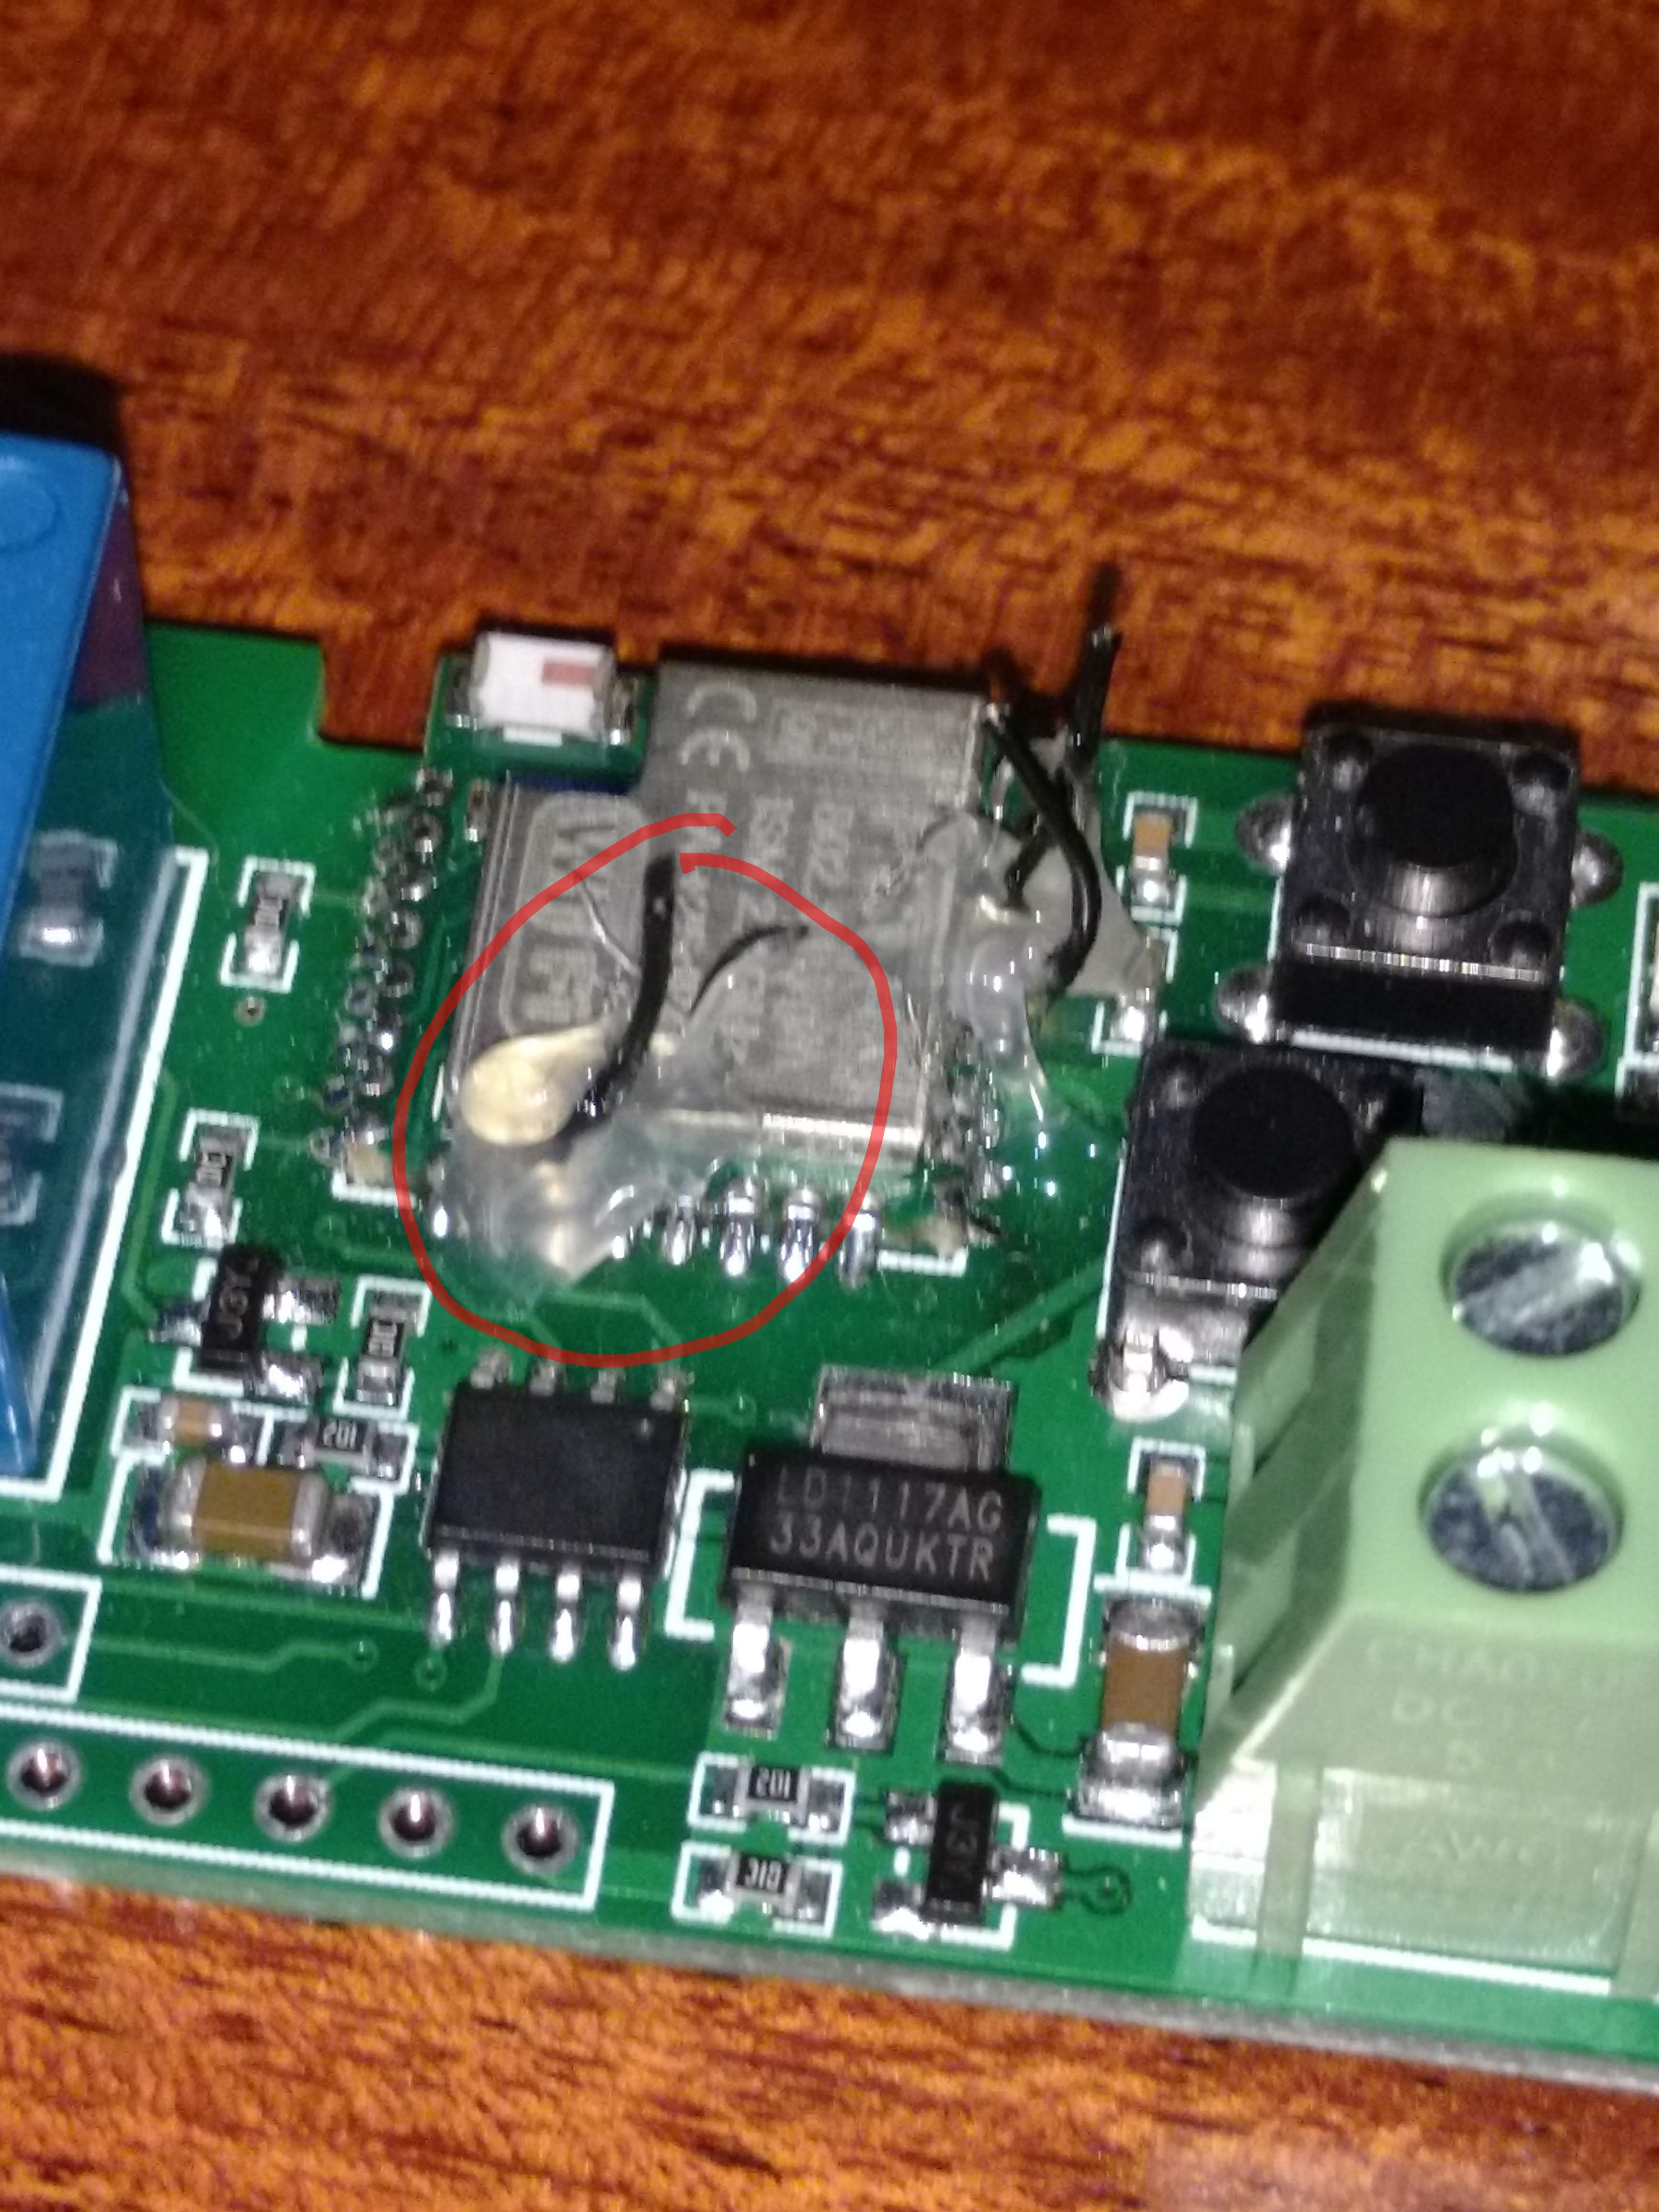 Developers - New ESP8285 based 1Channel Inching/Locking 5V